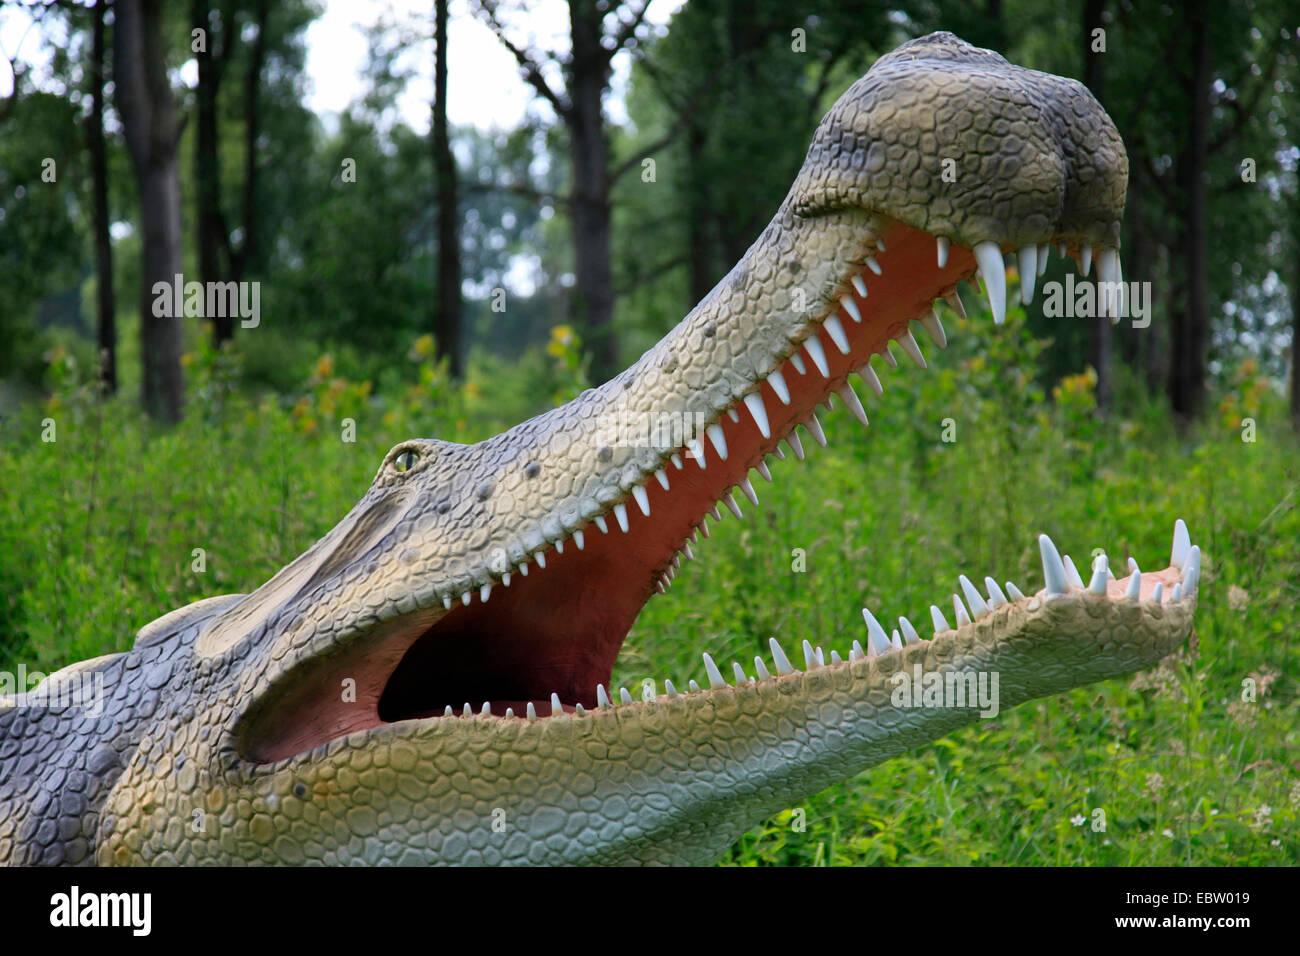 Homemade Coffee Table Supercroc Sarcosuchus Imperator Largest Crocodile Like